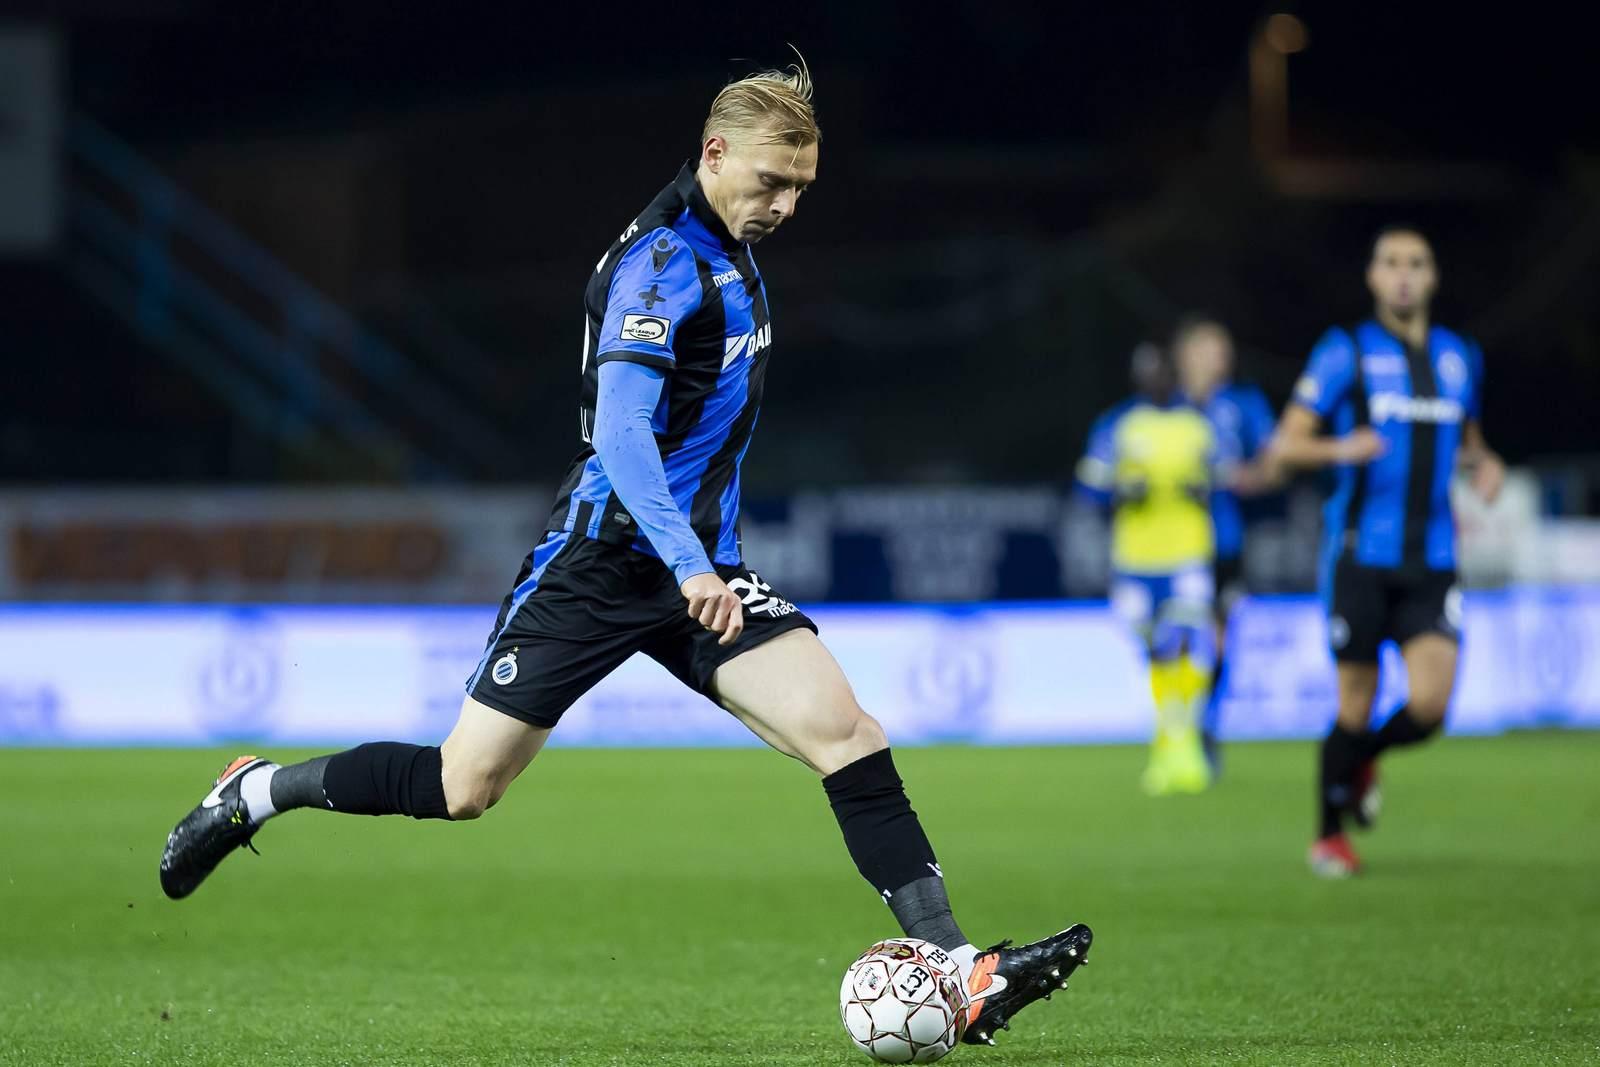 Saulo Decarli am Ball für den FC Brügge.